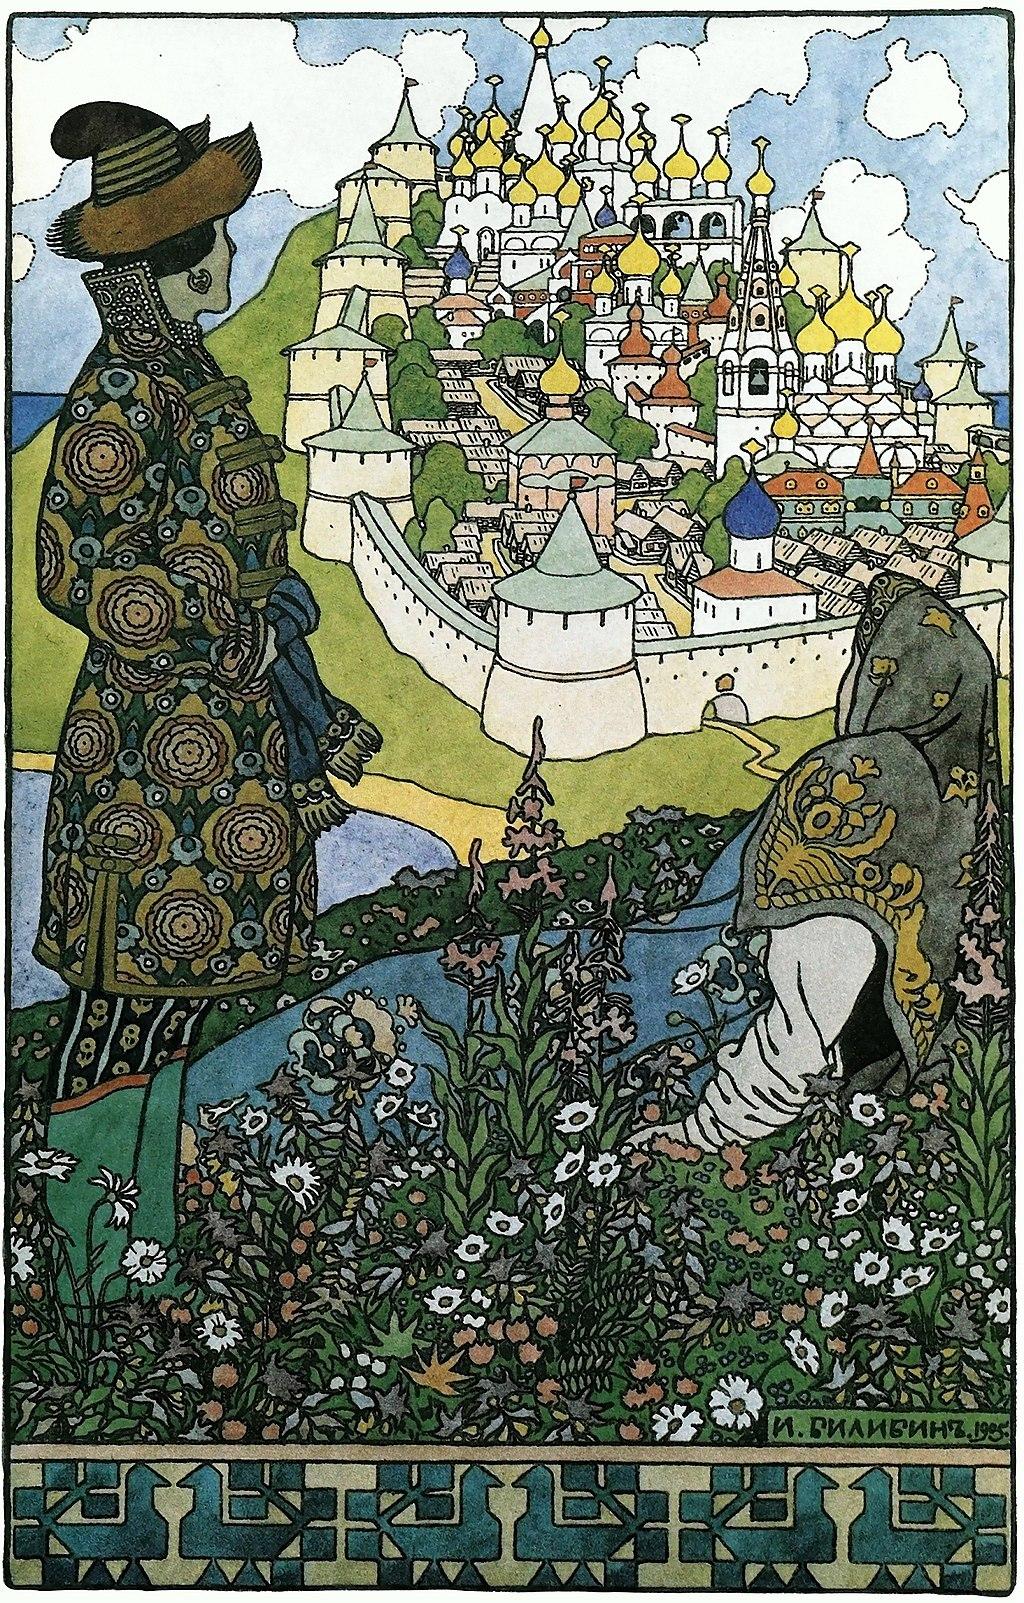 Ivan Bilibin - The Island of Buyan